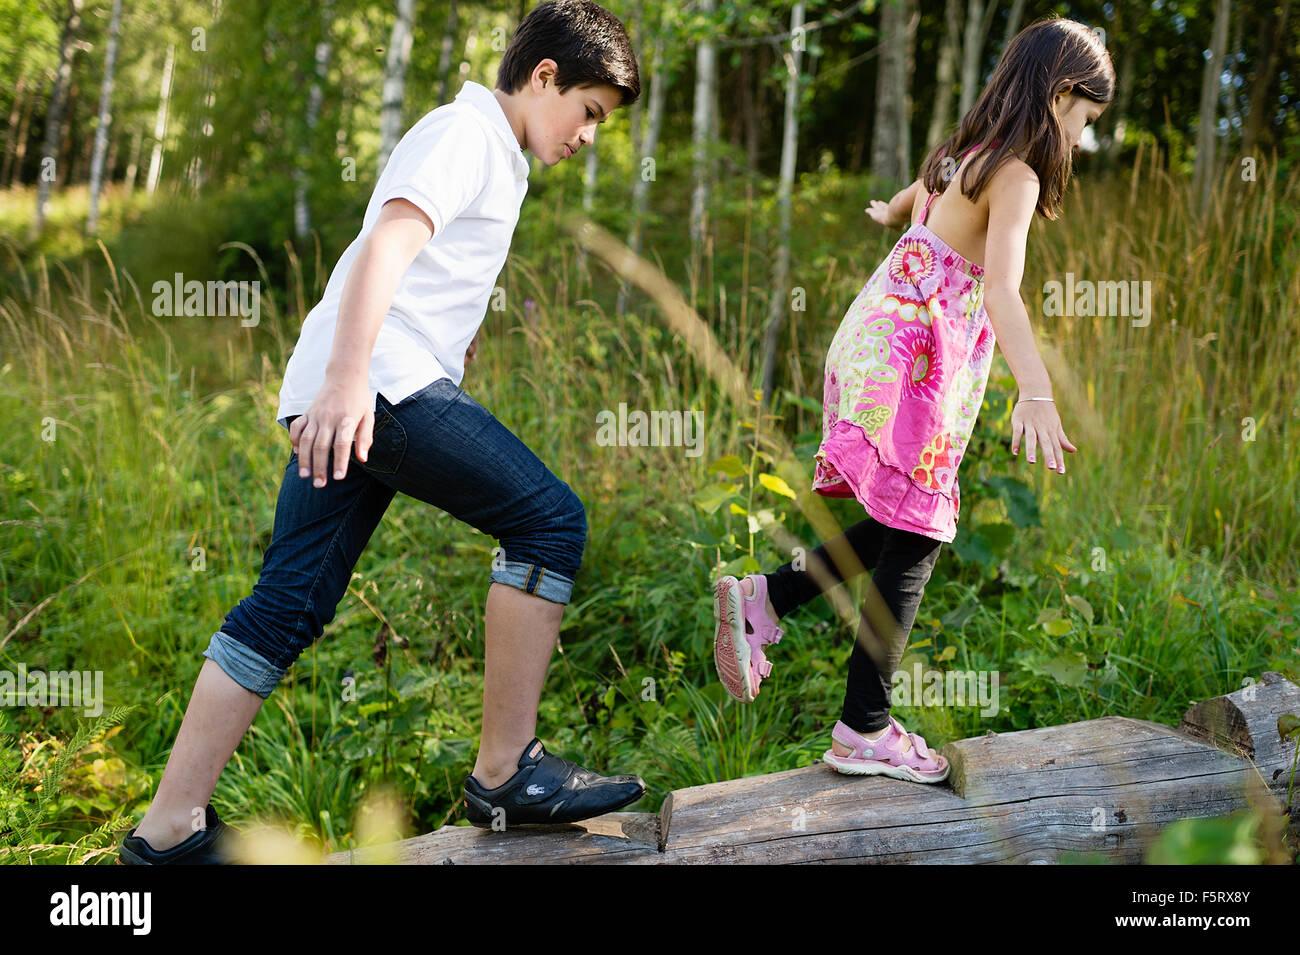 Sweden, Vastmanland, Bergslagen, Boy (10-11) and girl (6-7) walking along log - Stock Image